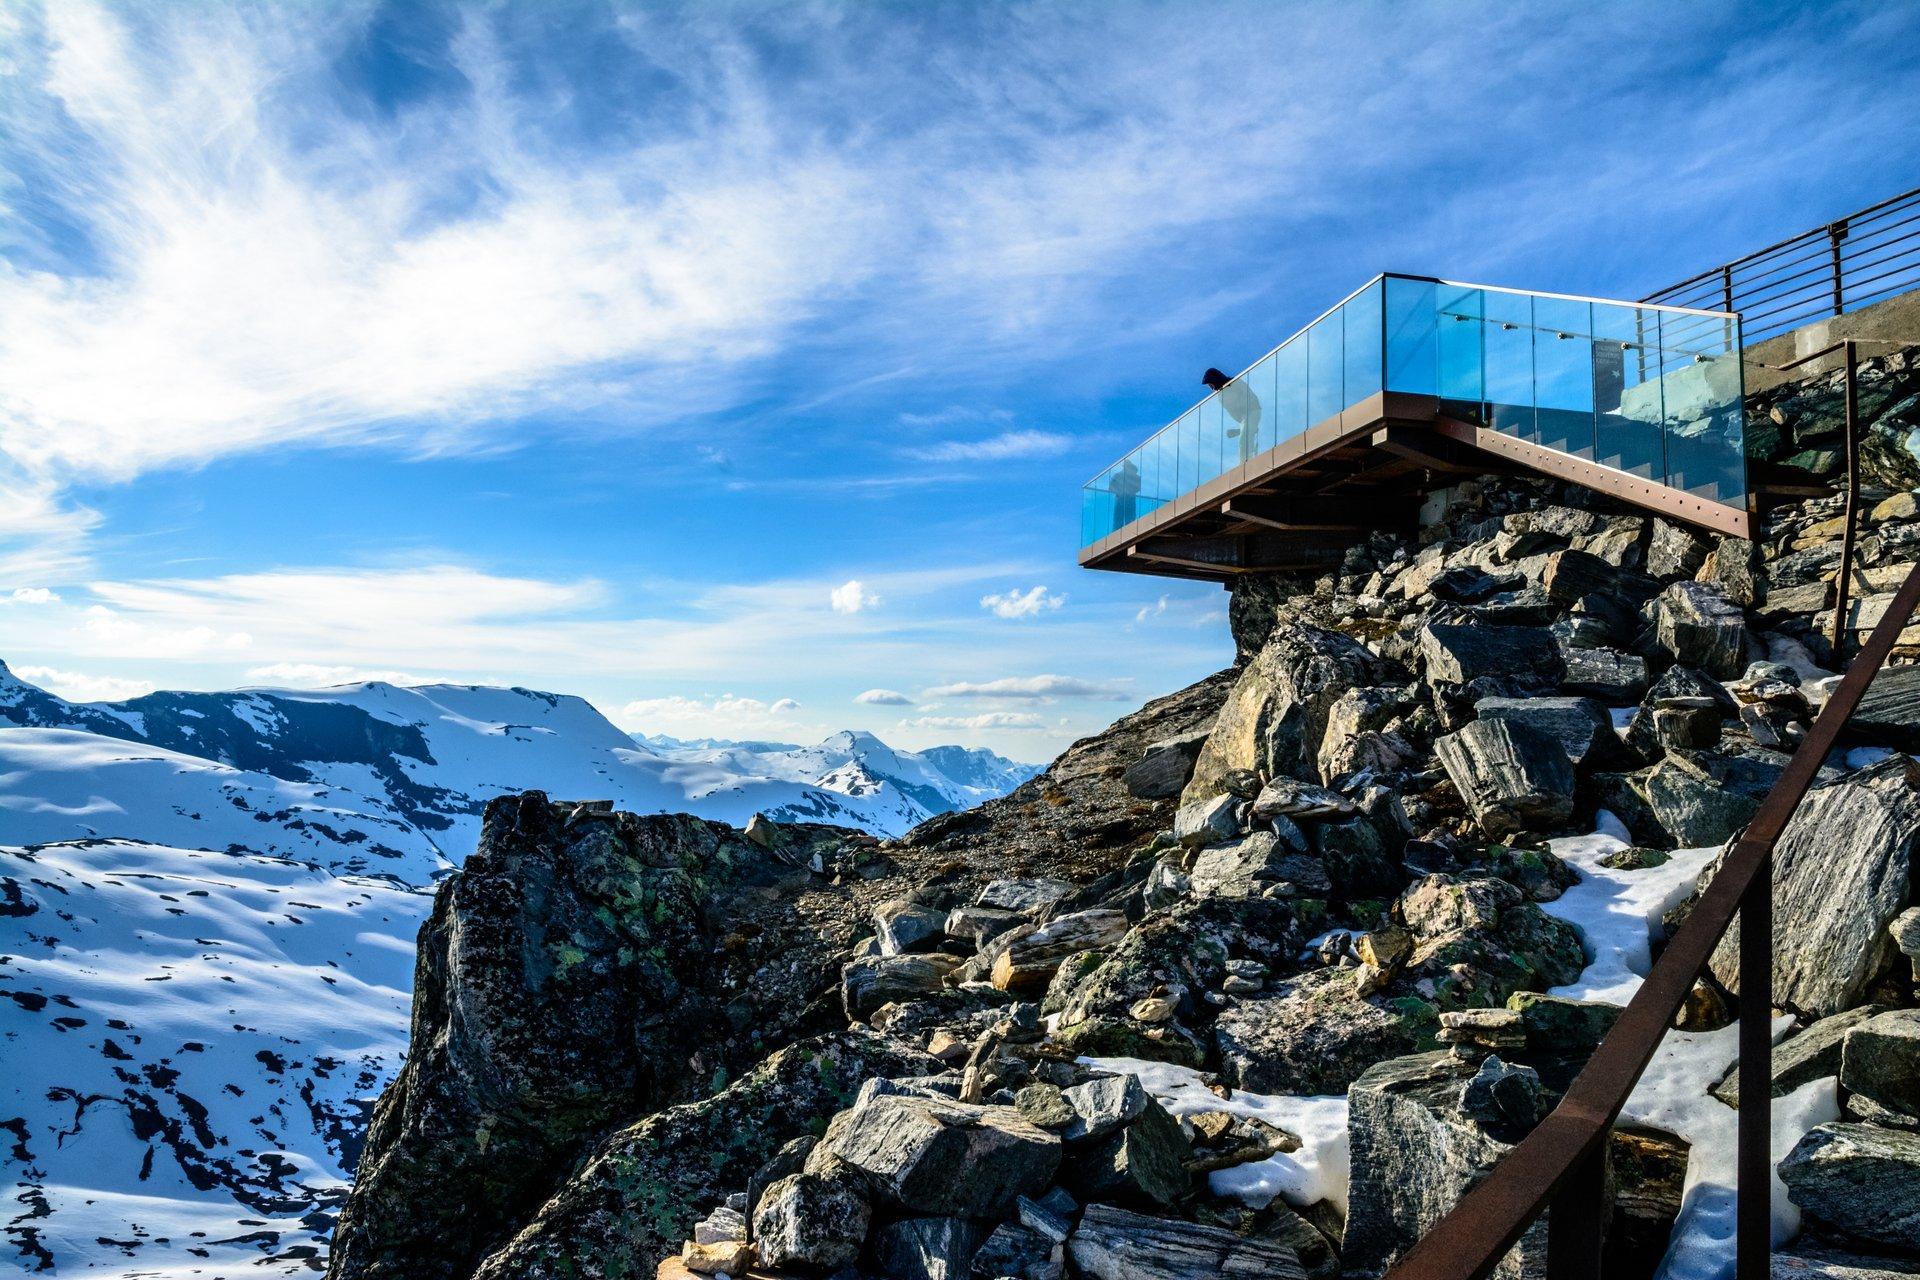 Dalsnibba in Norway - Best Season 2019